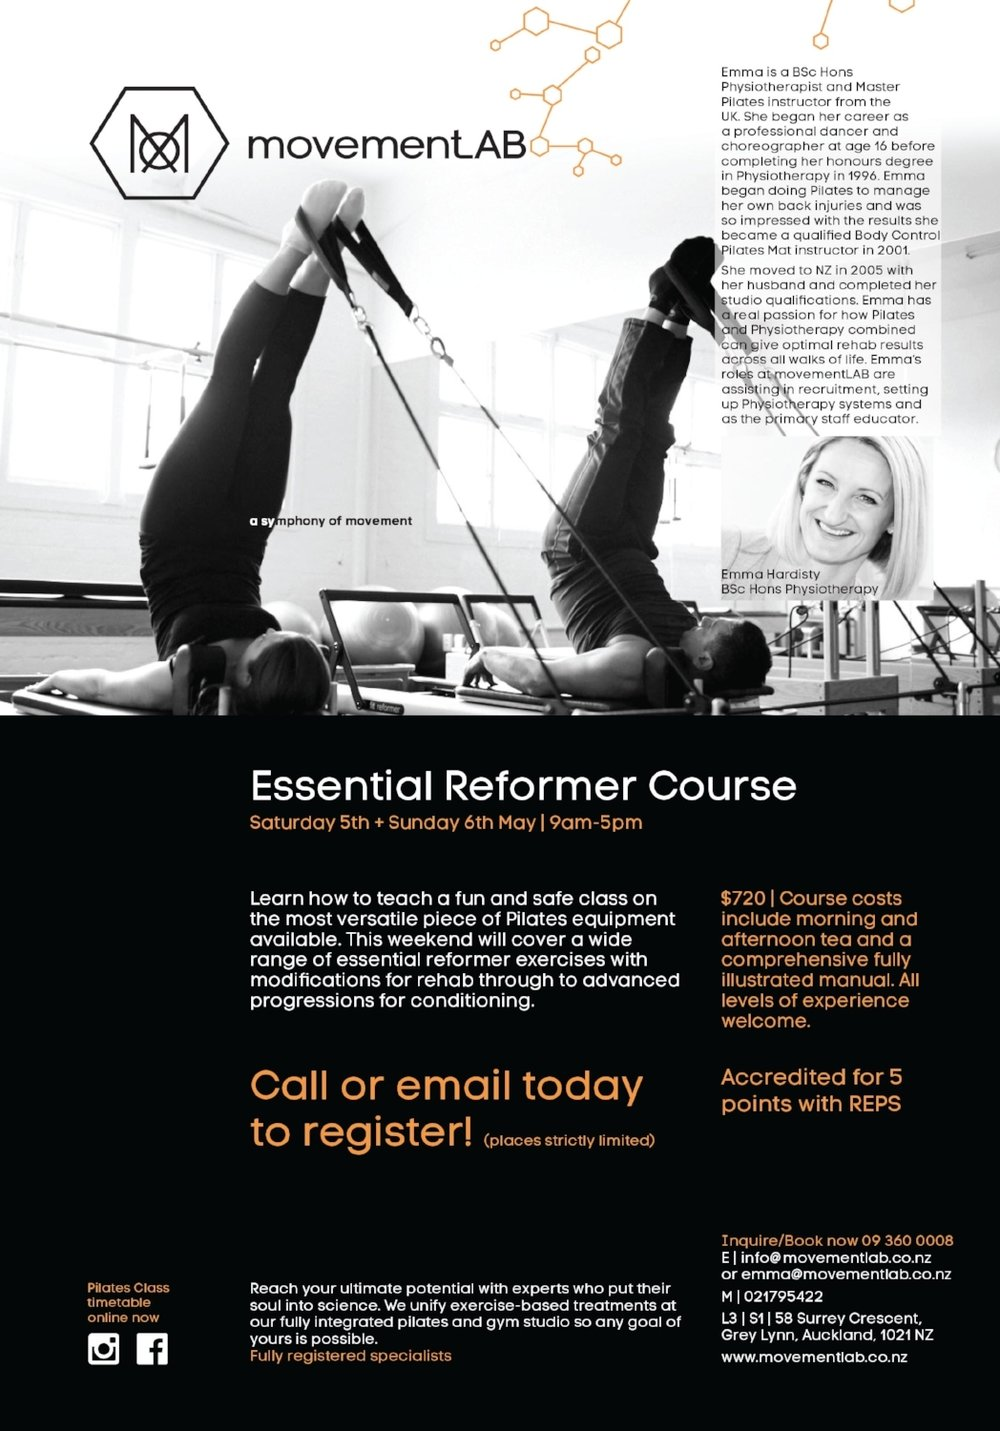 movementLAB essntial reformer course